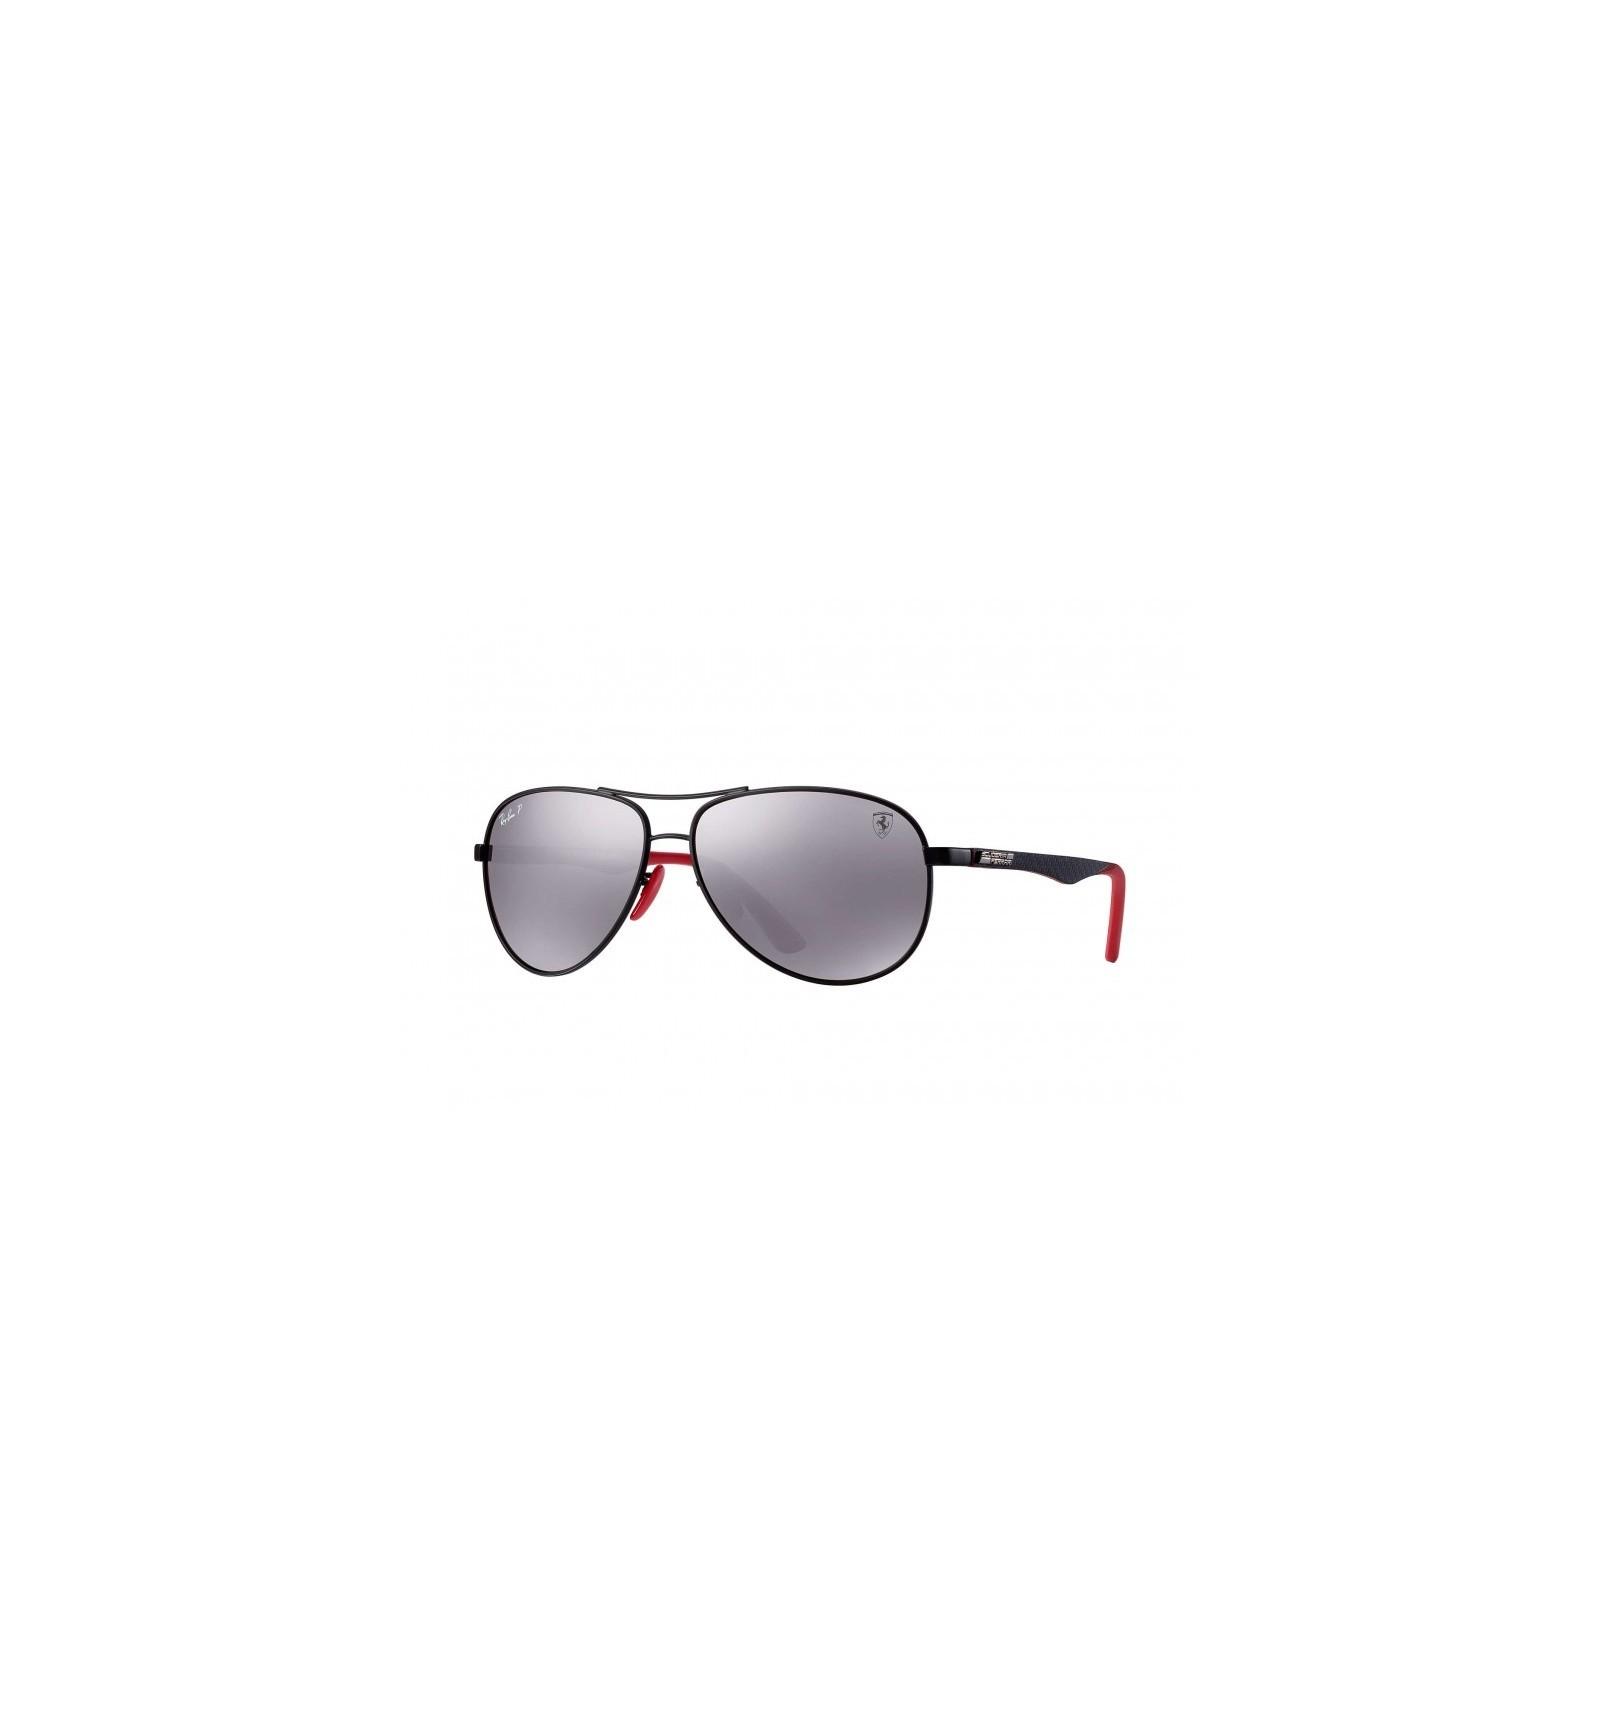 689069d75a460 Gafas de sol RAY BAN Ferrari 8313M Negro - Plata Mirror Chromance (F002H2)